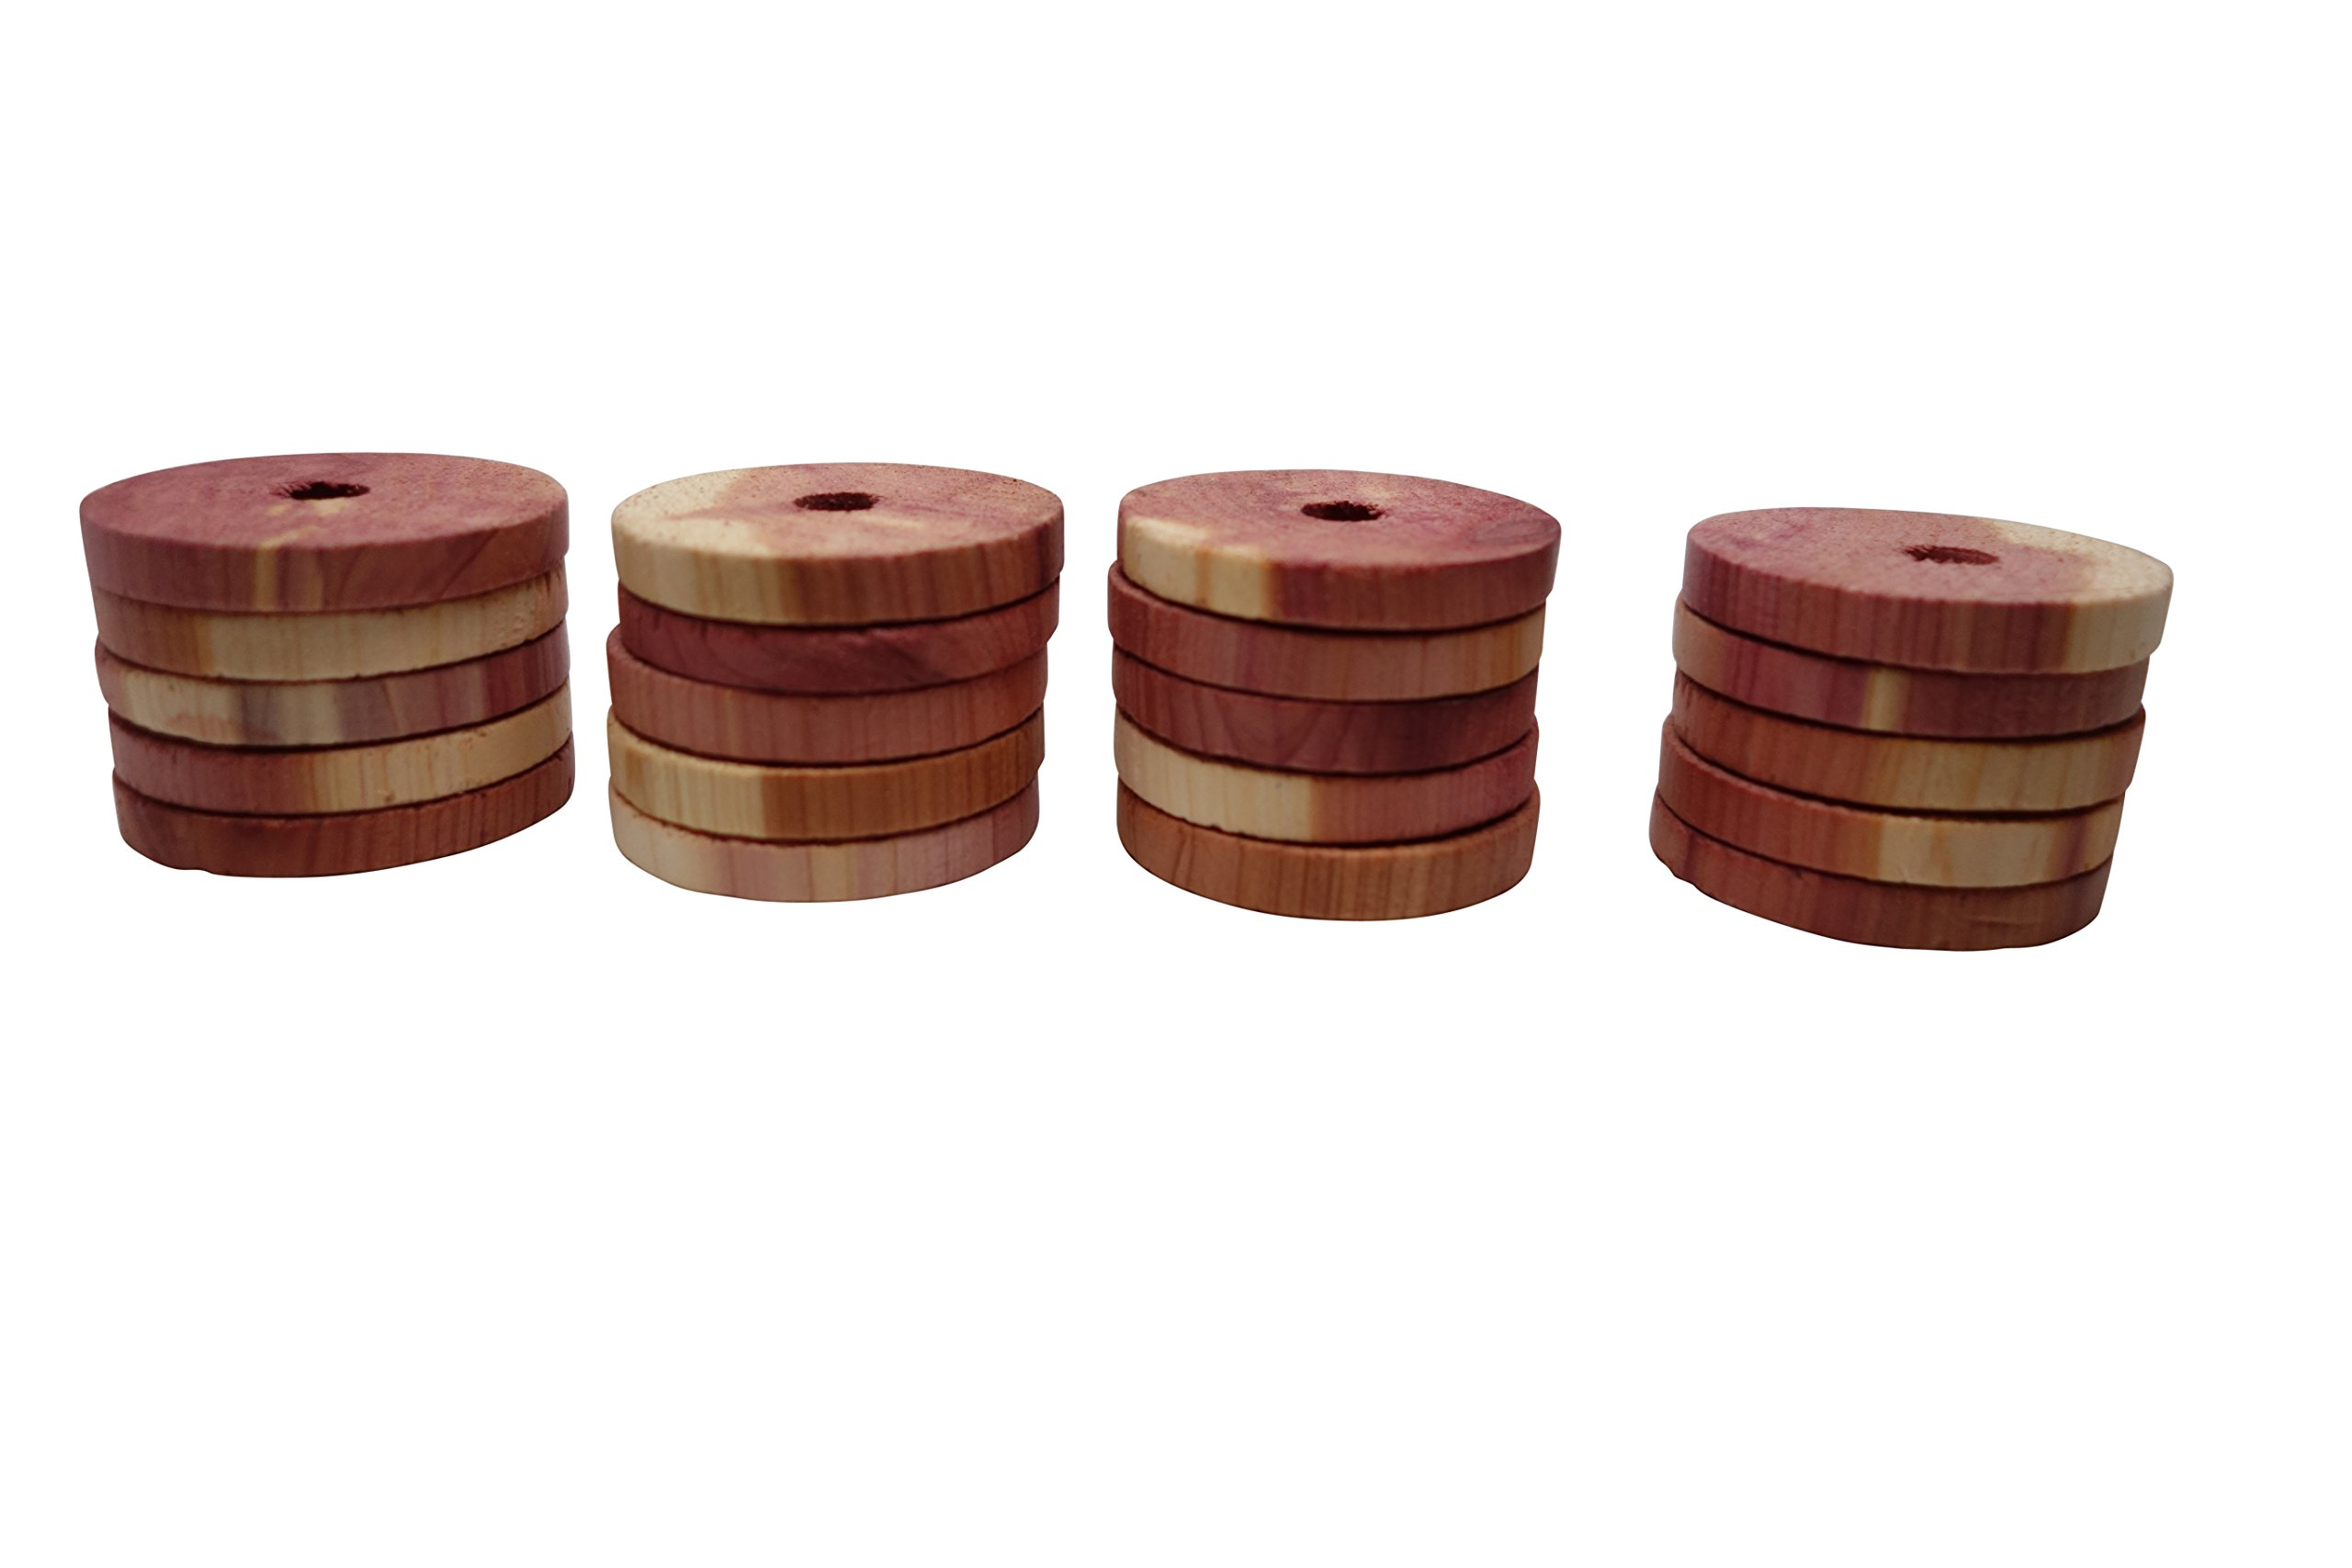 Cedar America Natural Aromatic Cedar Wood Hanger Rings, 2-Pack (40 Rings)